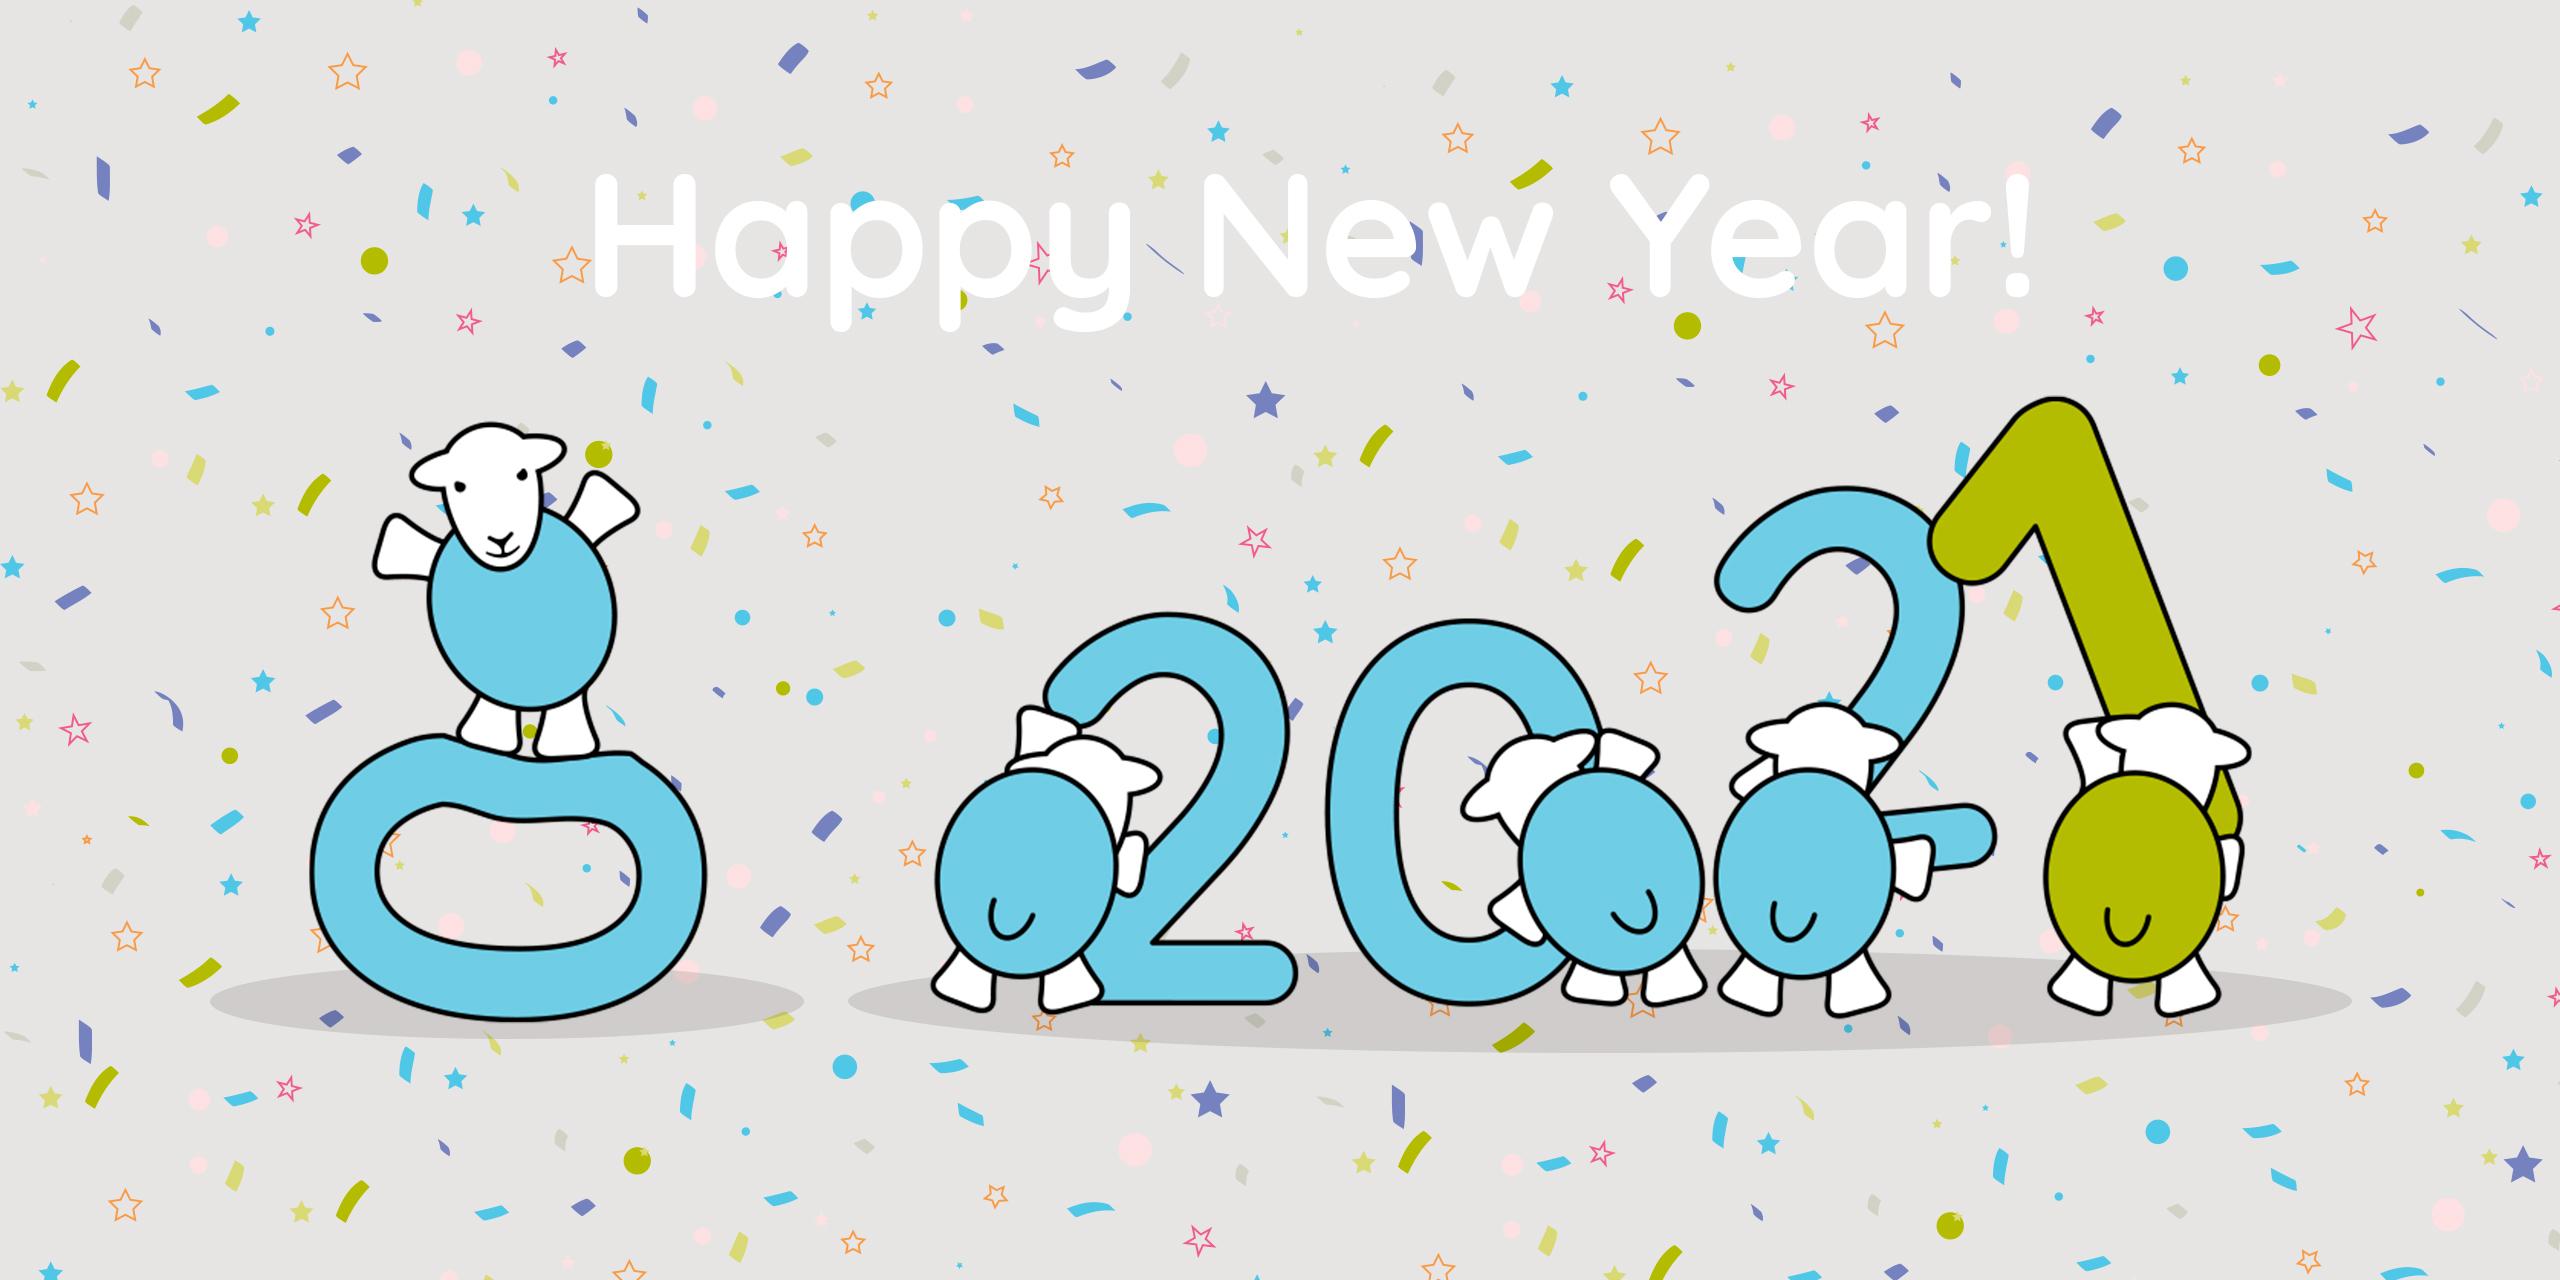 Herdy New Year Round Up 2020